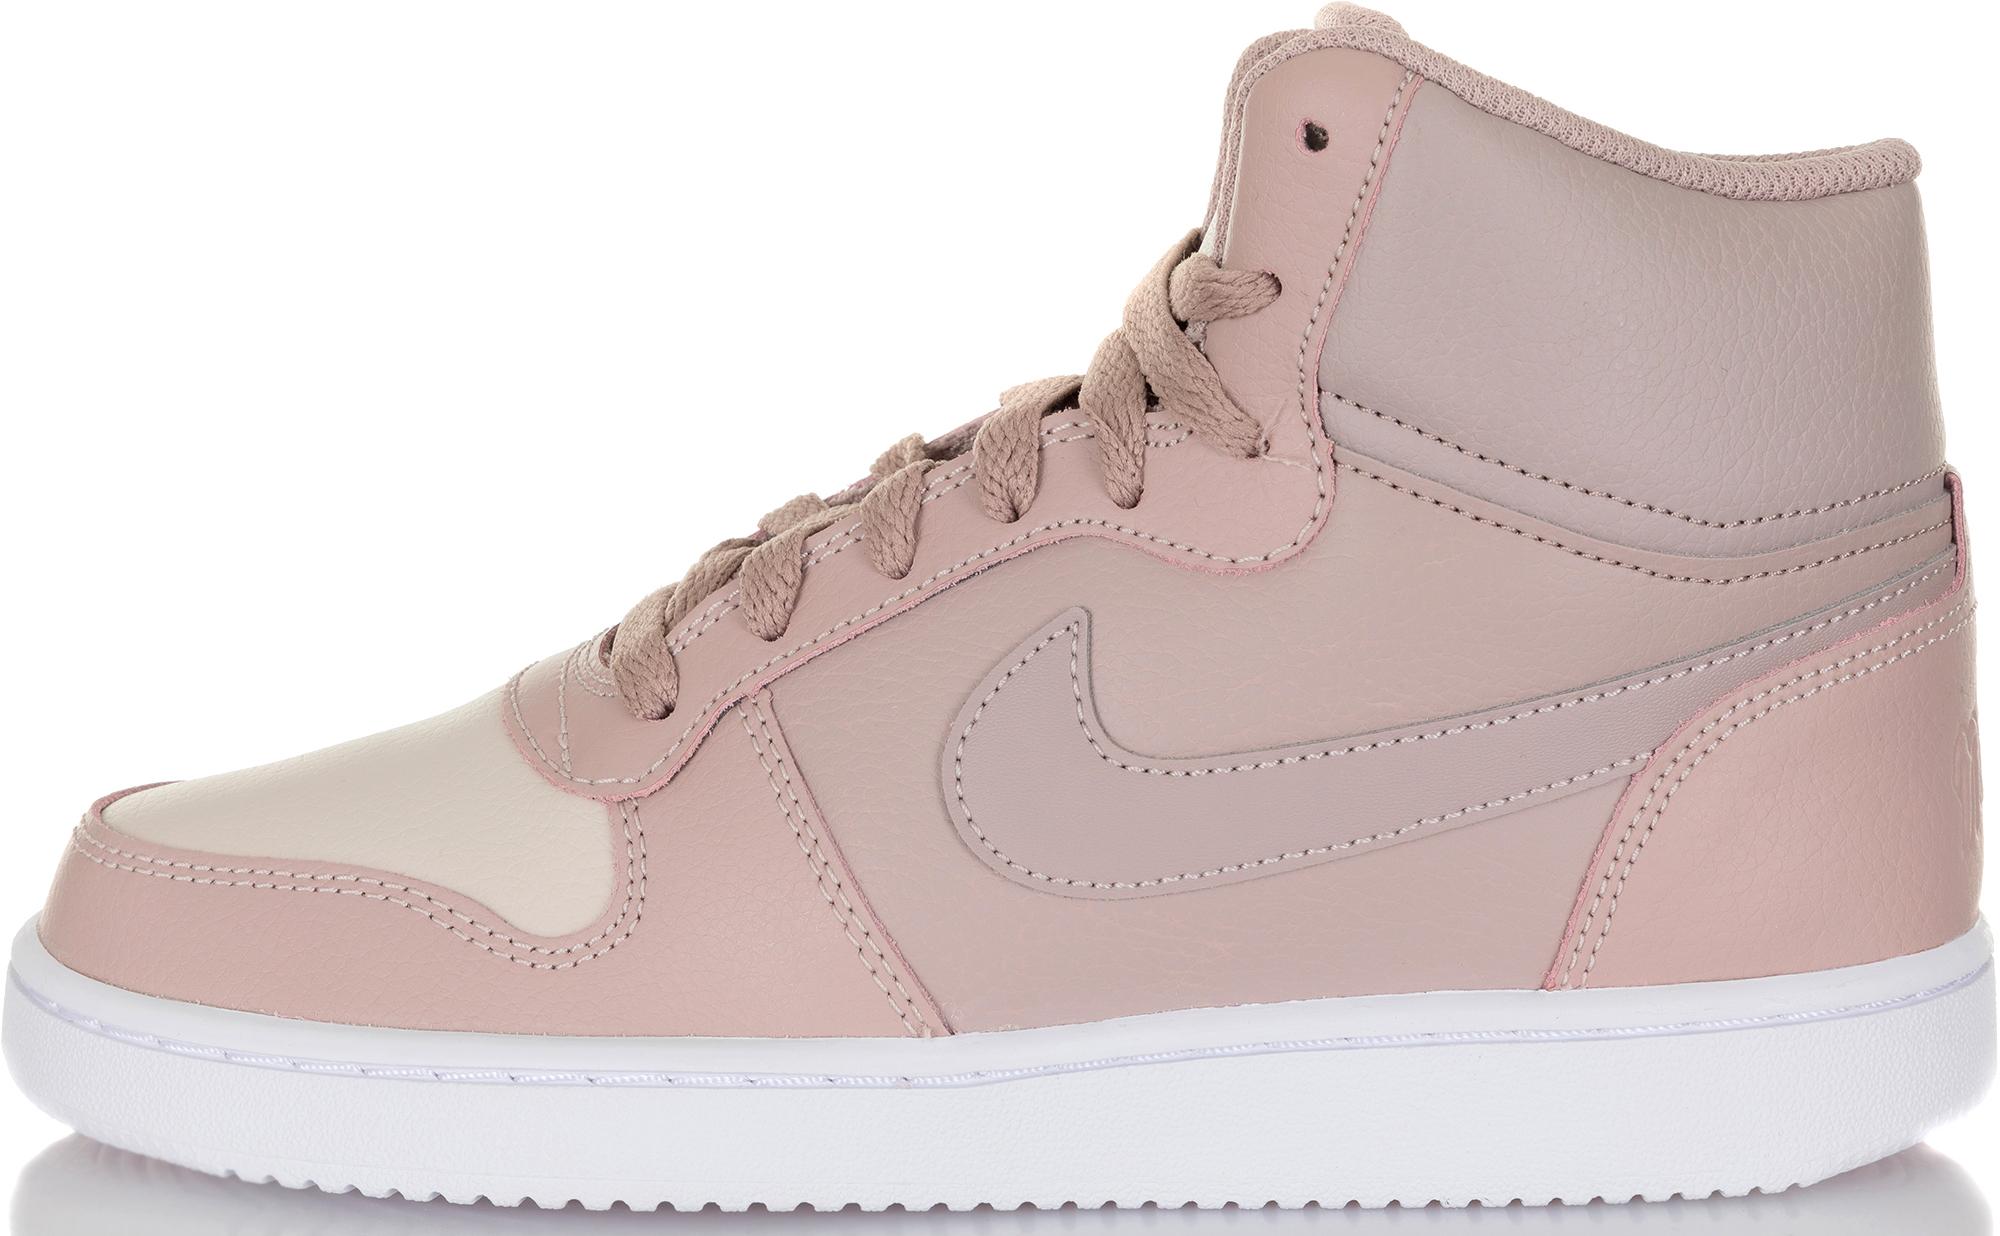 Nike Кеды женские Nike Ebernon Mid, размер 35,5 цены онлайн